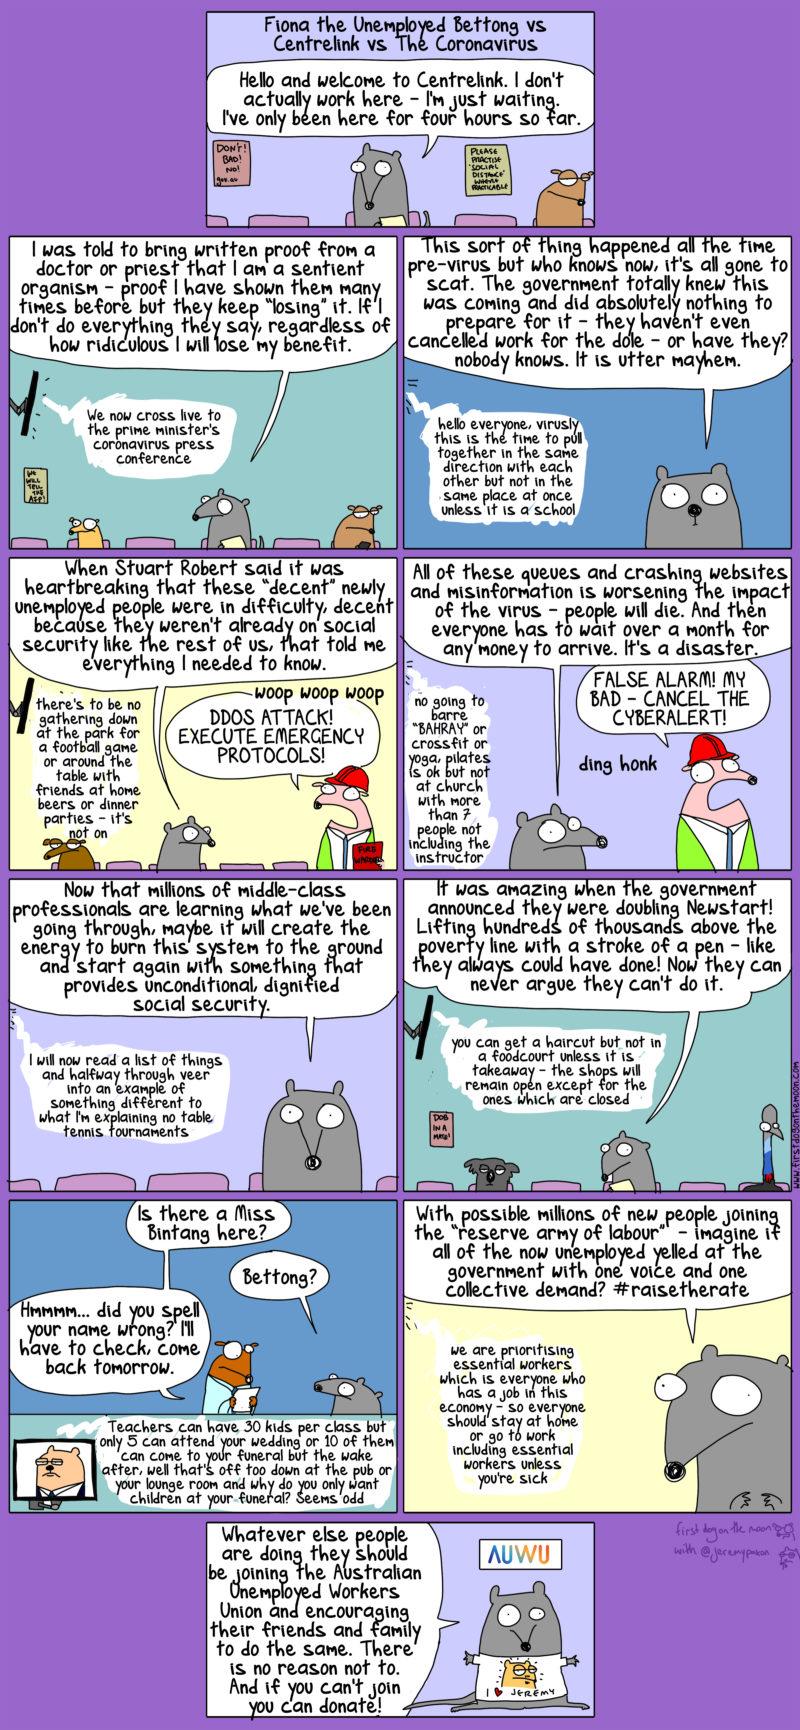 Fiona the Unemployed Bettong vs Centrelink vs the coronavirus